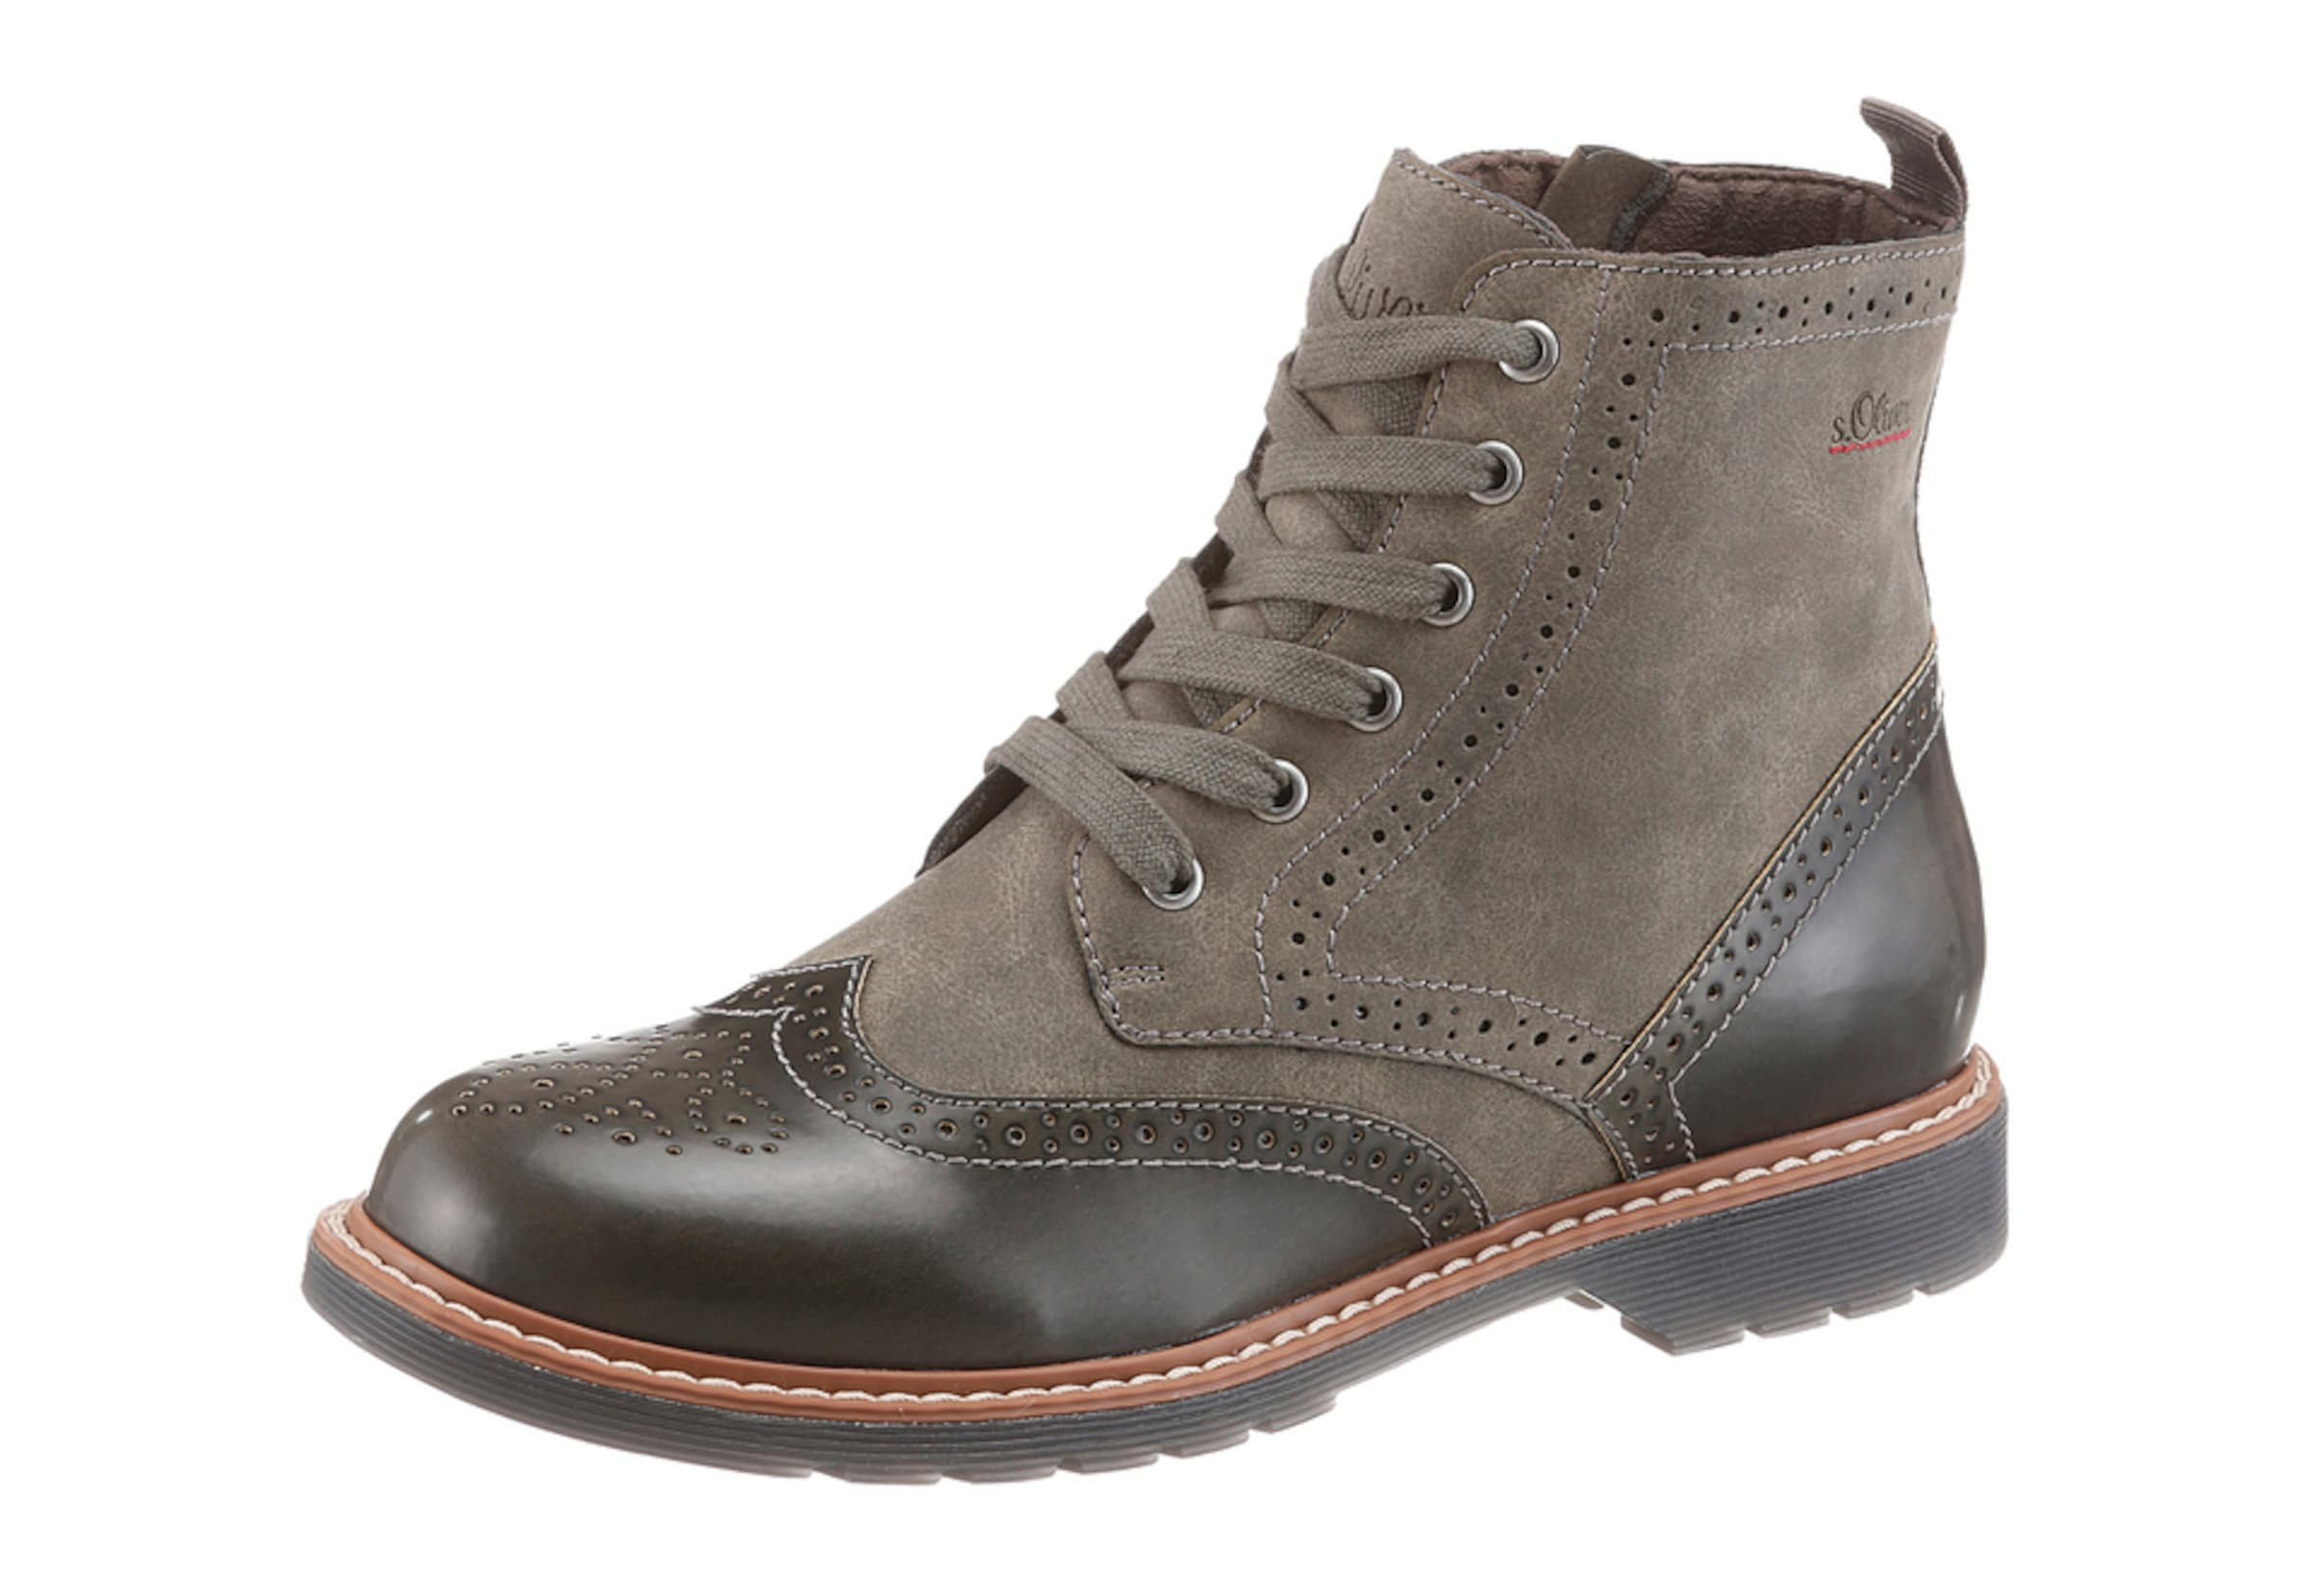 s.Oliver RED LABEL Boots Verschleißfeste Schuhe billige Schuhe Verschleißfeste b0e3dc